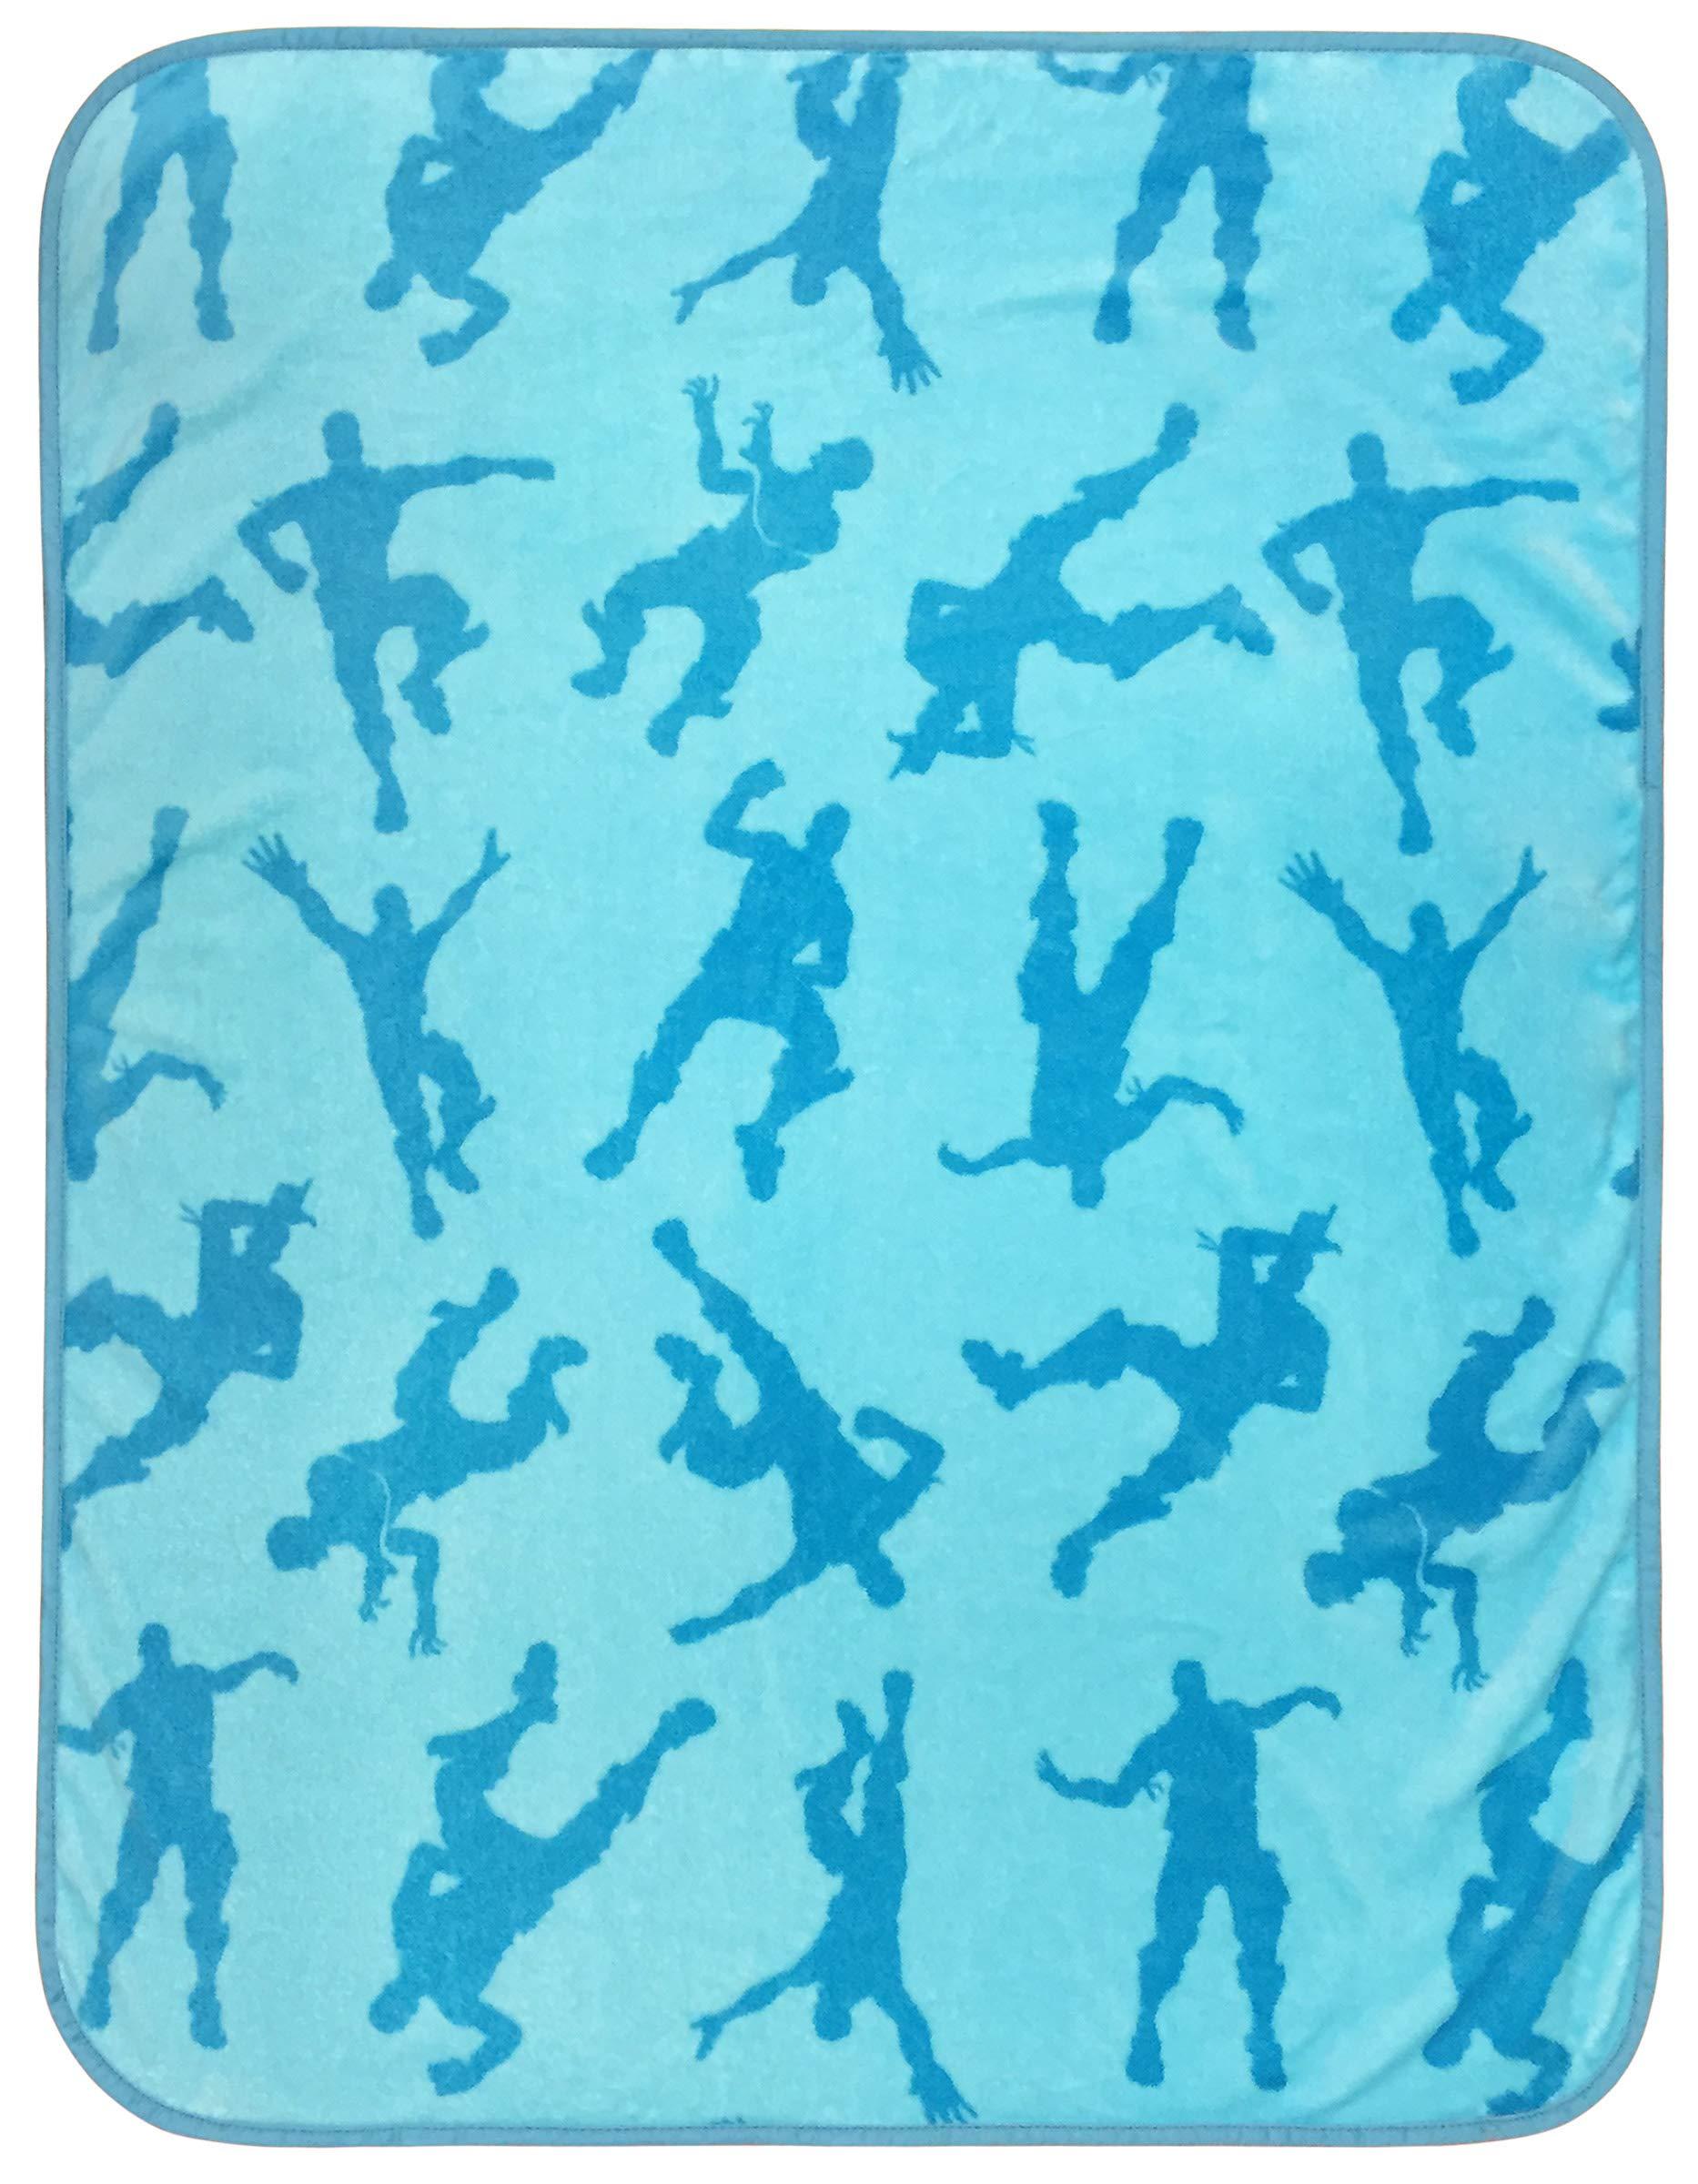 Jay Franco Fortnite Emotes Blue Travel Blanket - Measures 40 x 50 inches, Kids Bedding - Fade Resistant Super Soft Plush Fleece - (Official Fortnite Product) by Fortnite